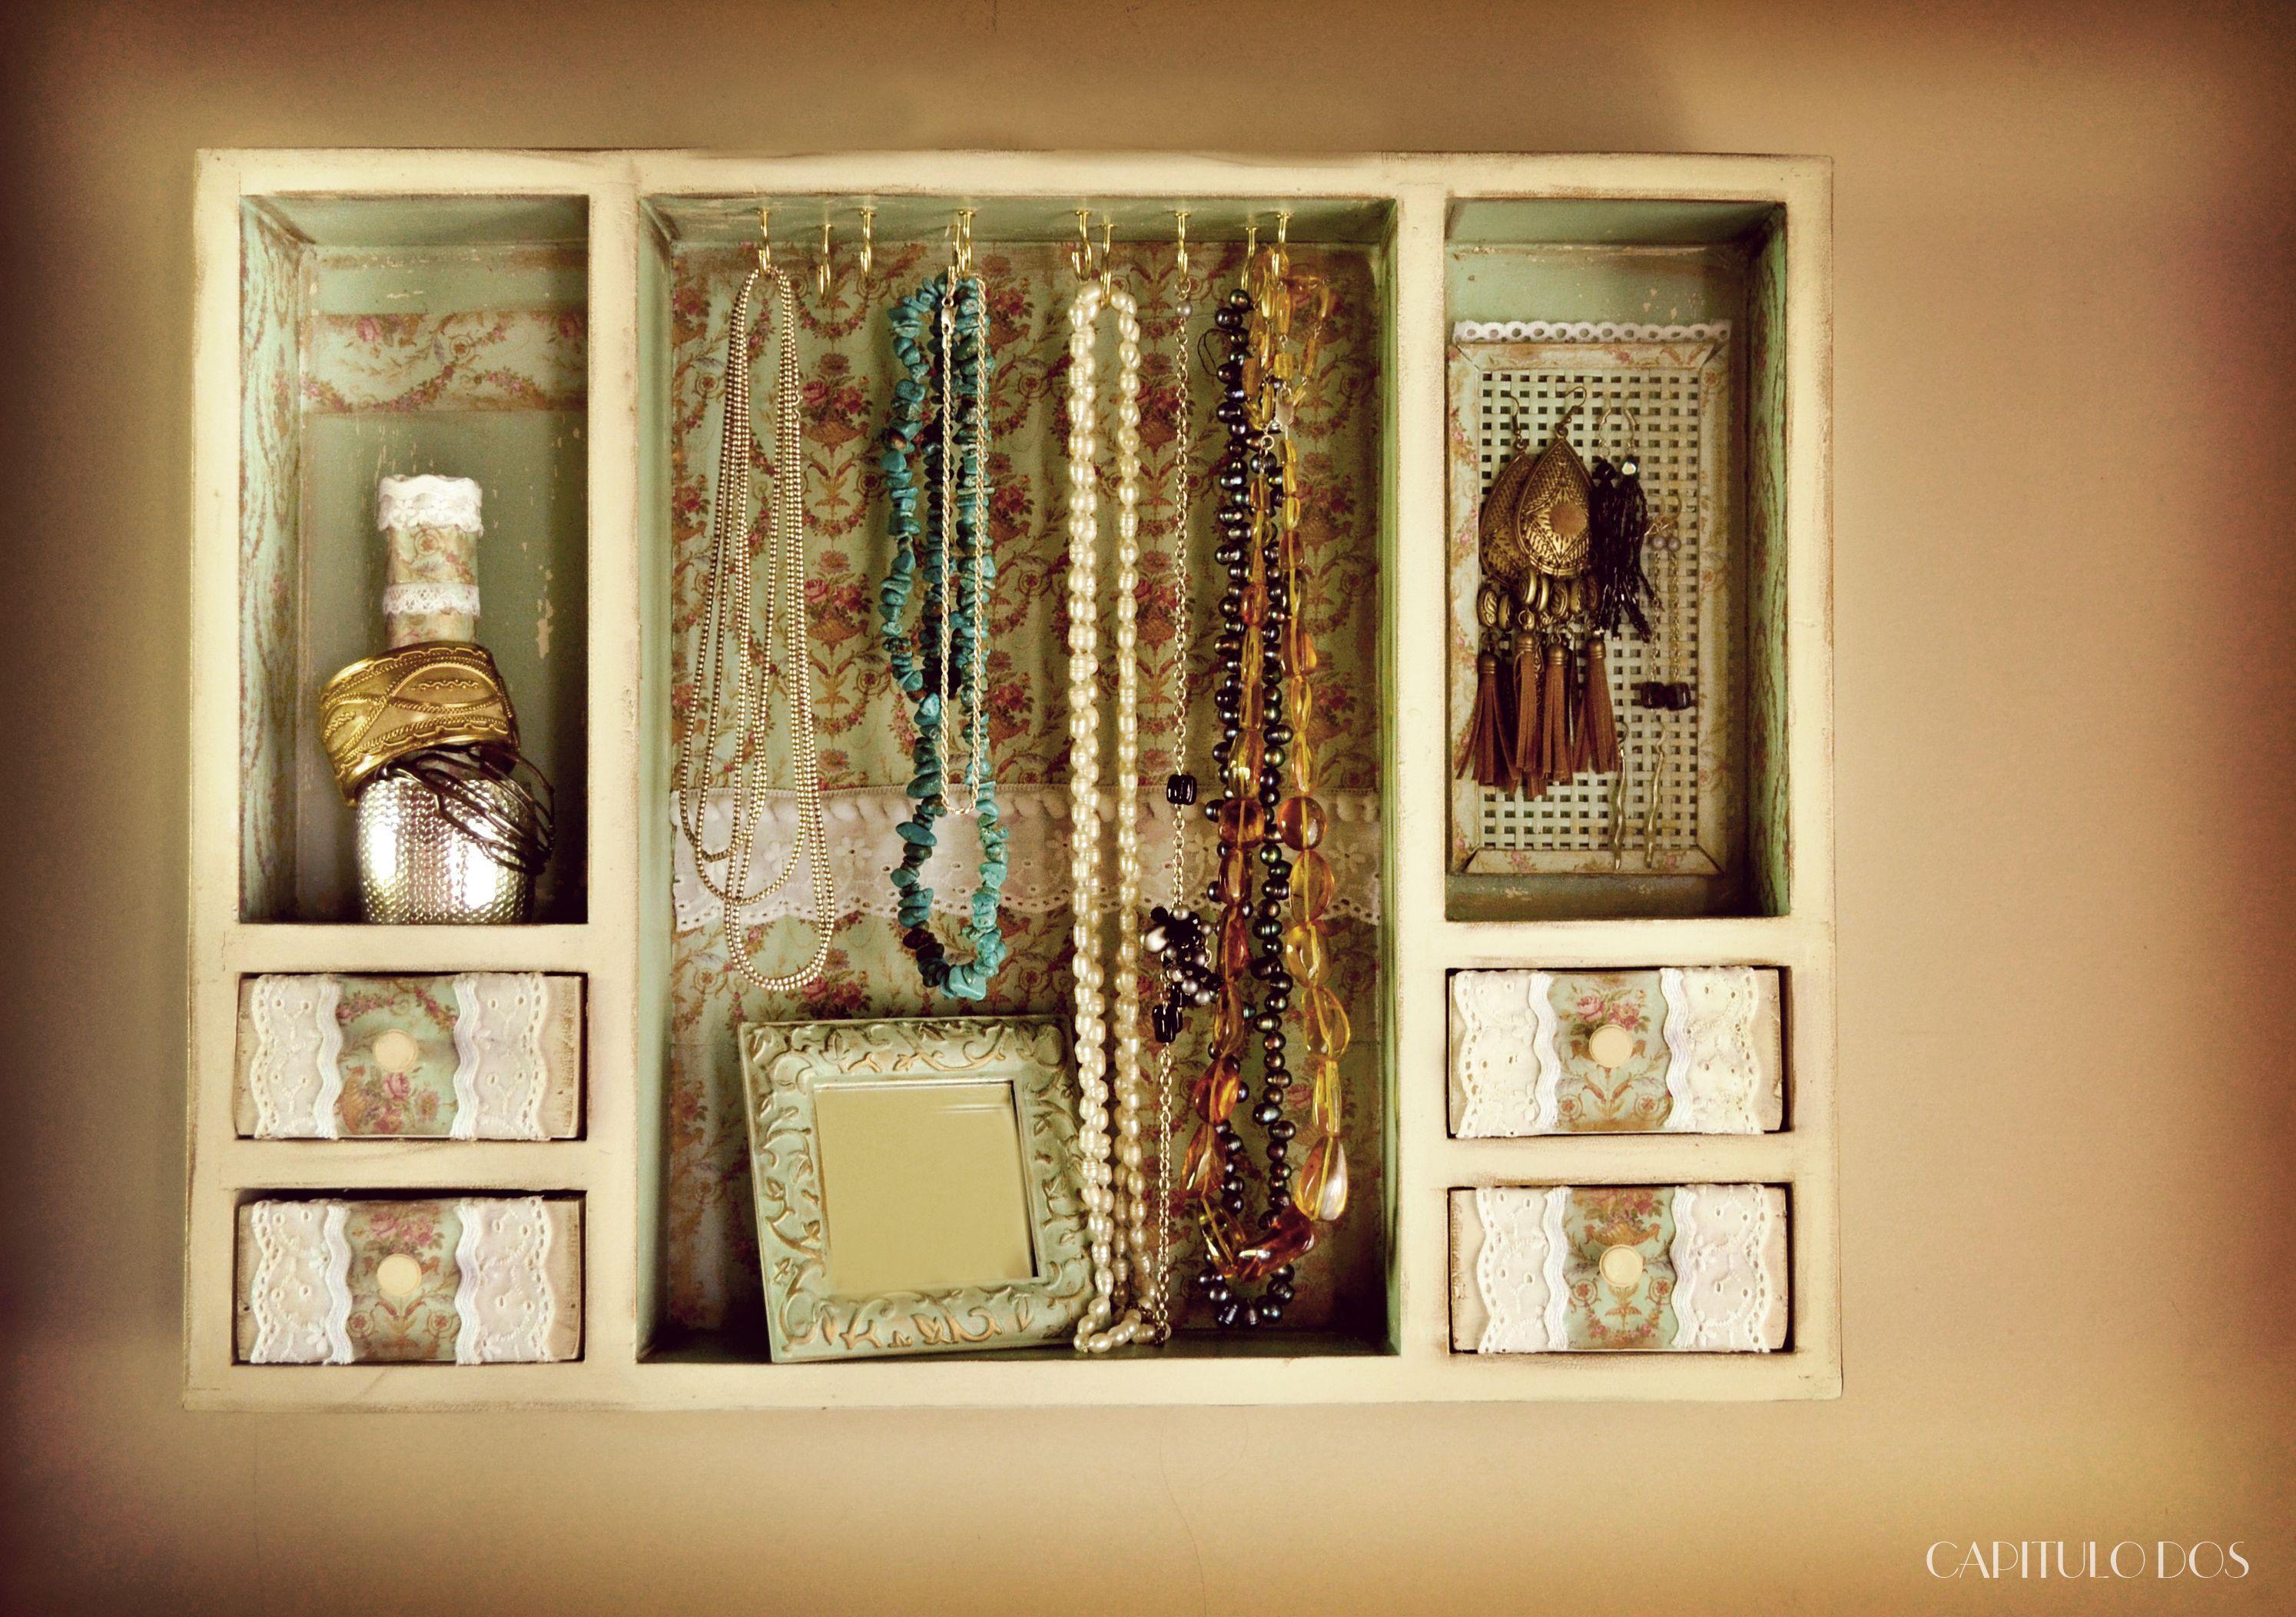 Antiguo botiquin ahora organizador de bijou dise os de capitulo dos pinterest diy bedroom - Botiquin antiguo ...